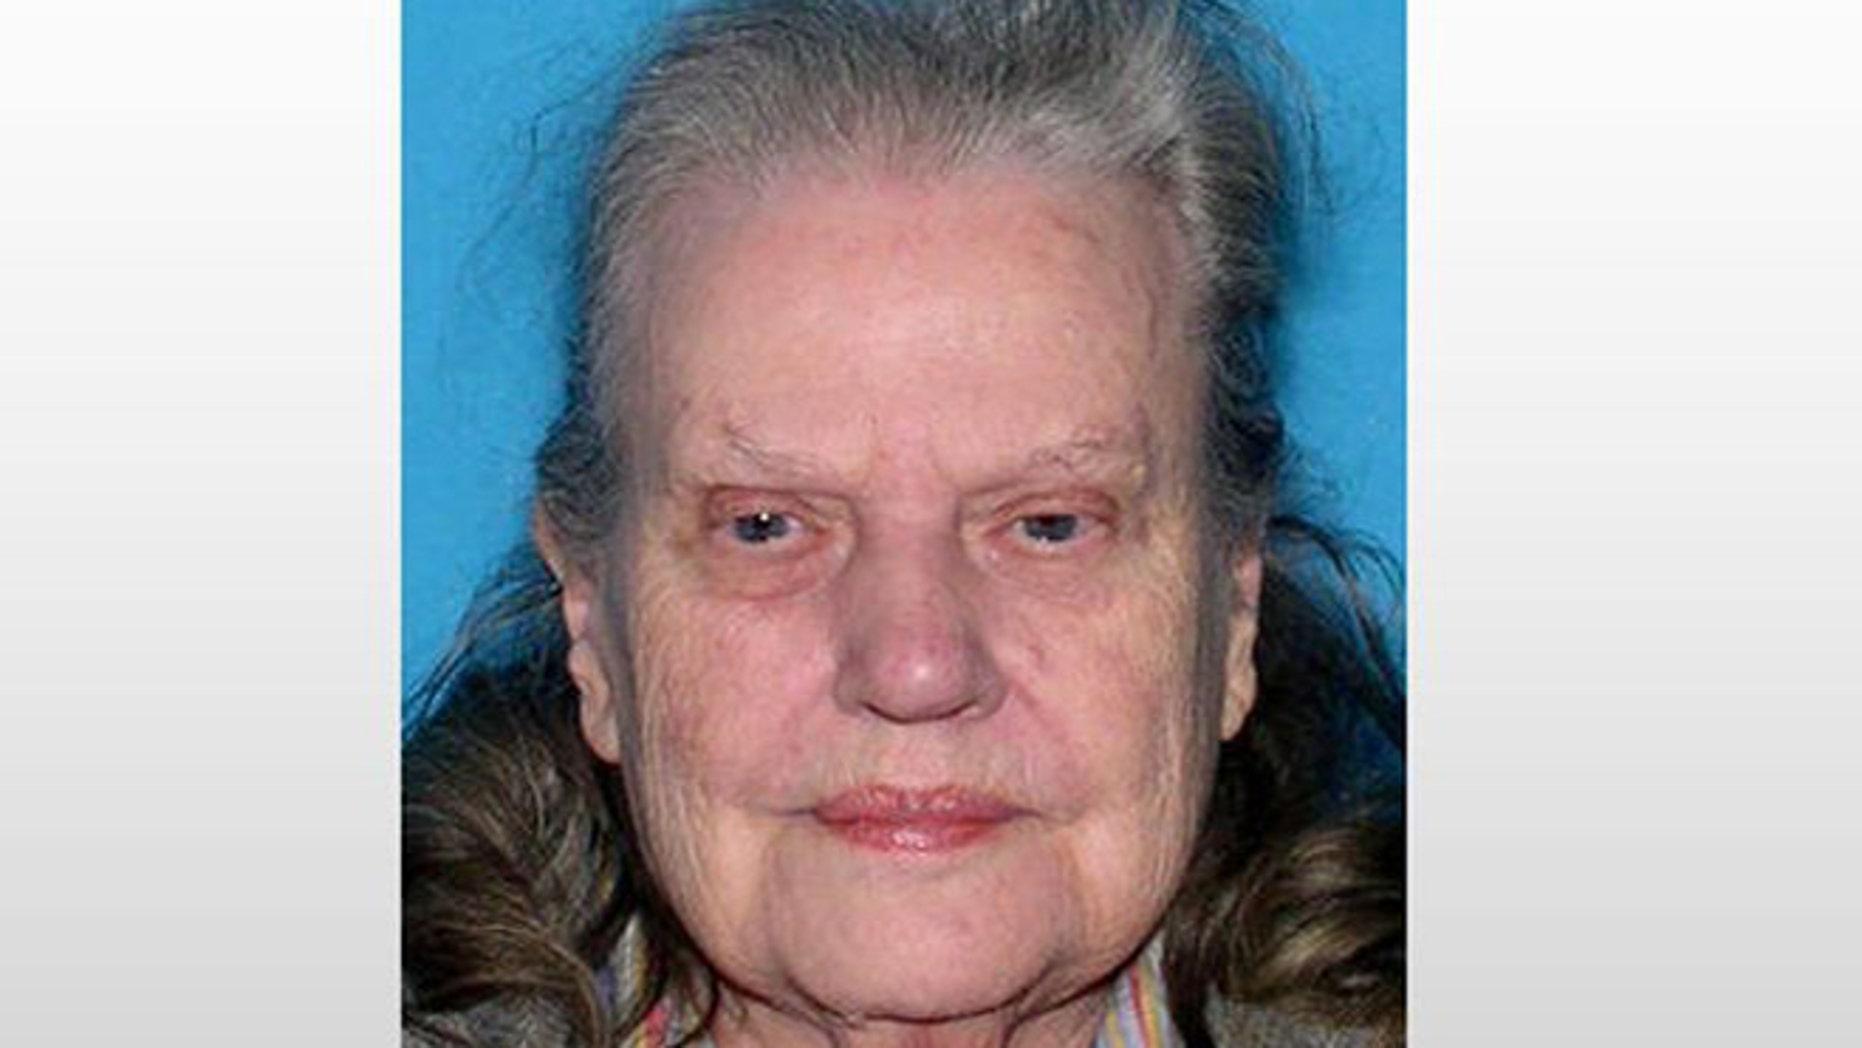 Bernadine Montgomery, 84, of Leesburg, Fla., has been missing since June 15. (Leesburg Police Department)